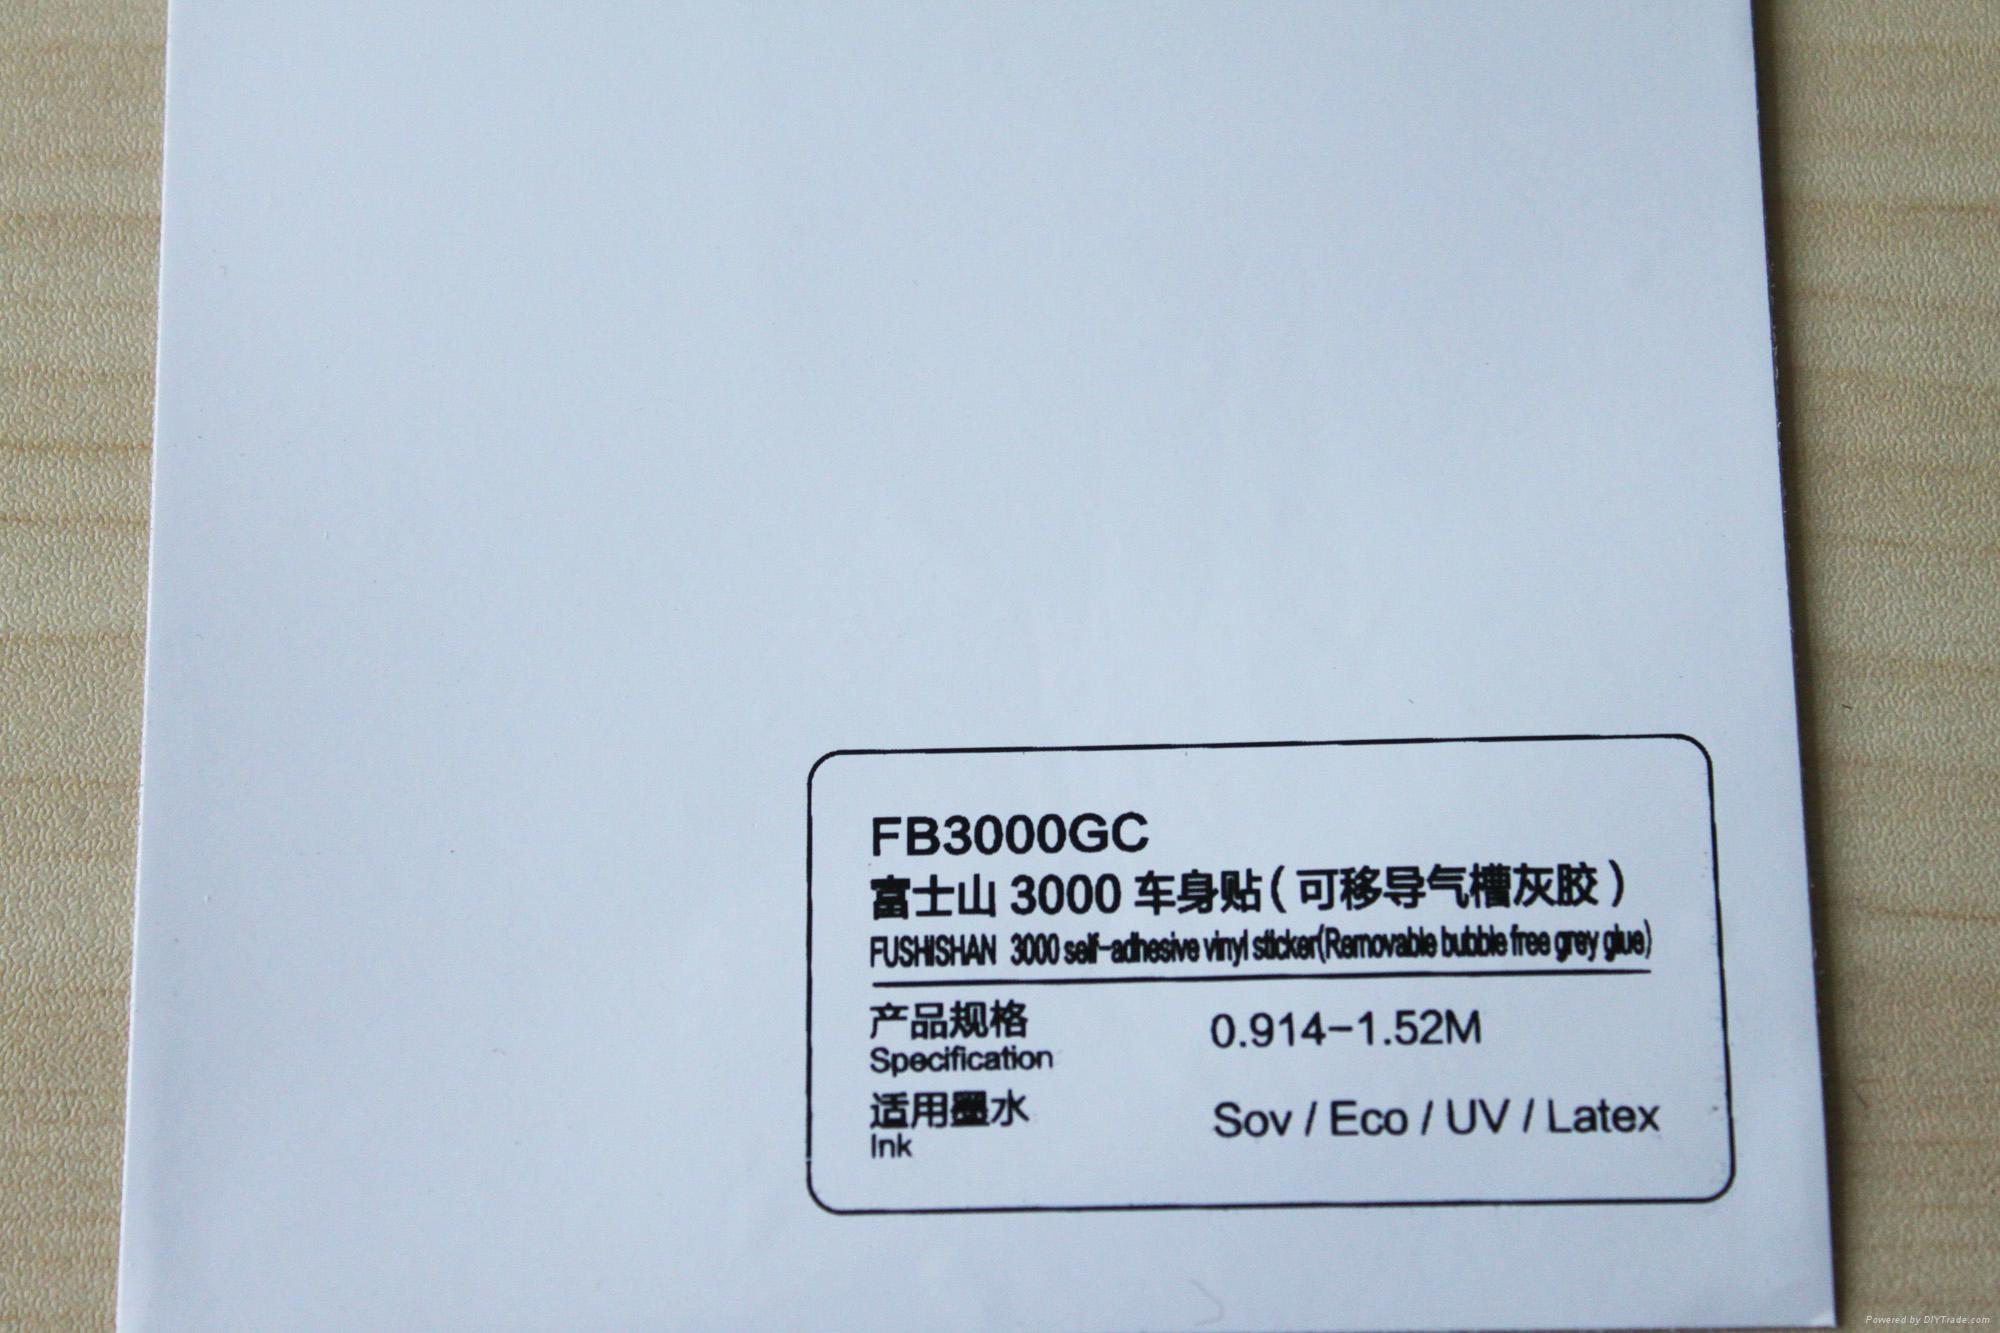 PVC FUSHISHAN 3000 self adhesive vinyl sticker(removable bubble free grey glue) 2